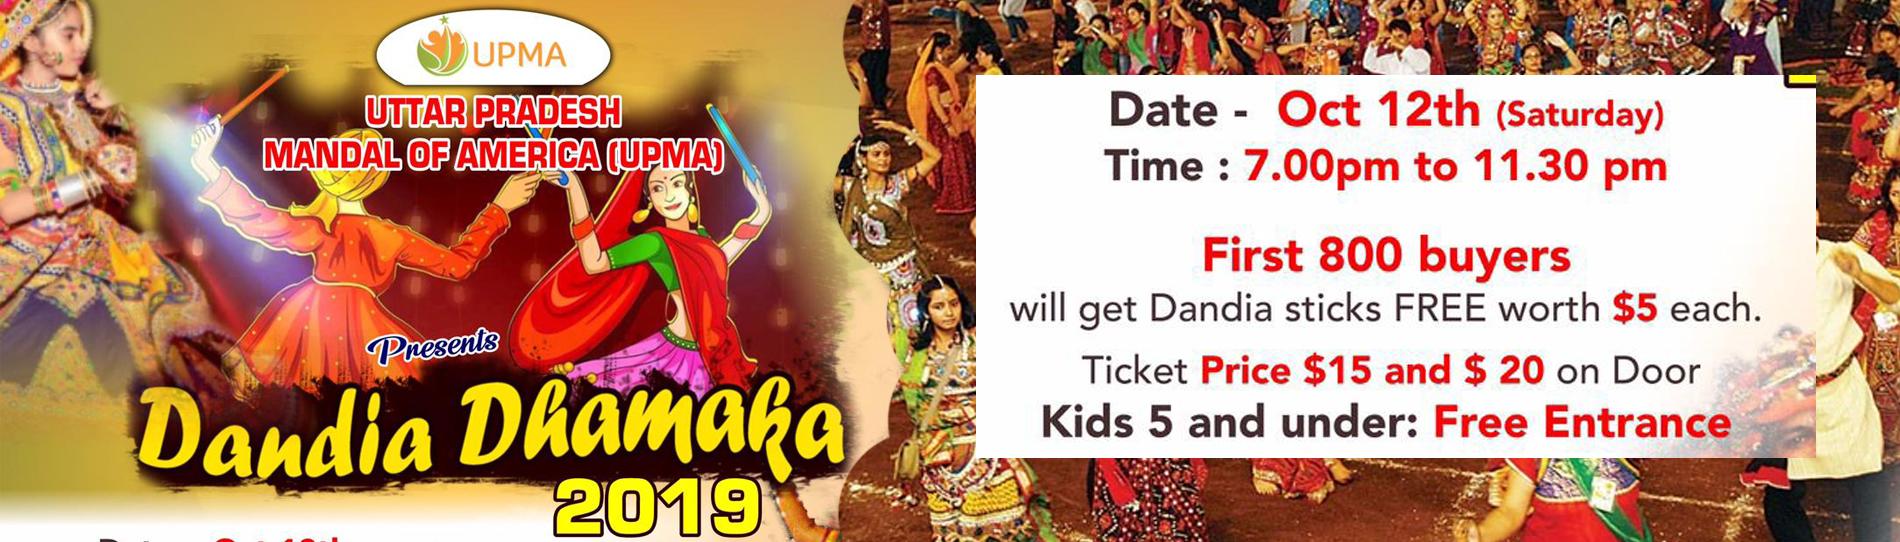 Upma Dandia Dhamaka 2019  (In Door @ Santa Clara Count Fair Grounds Hall)